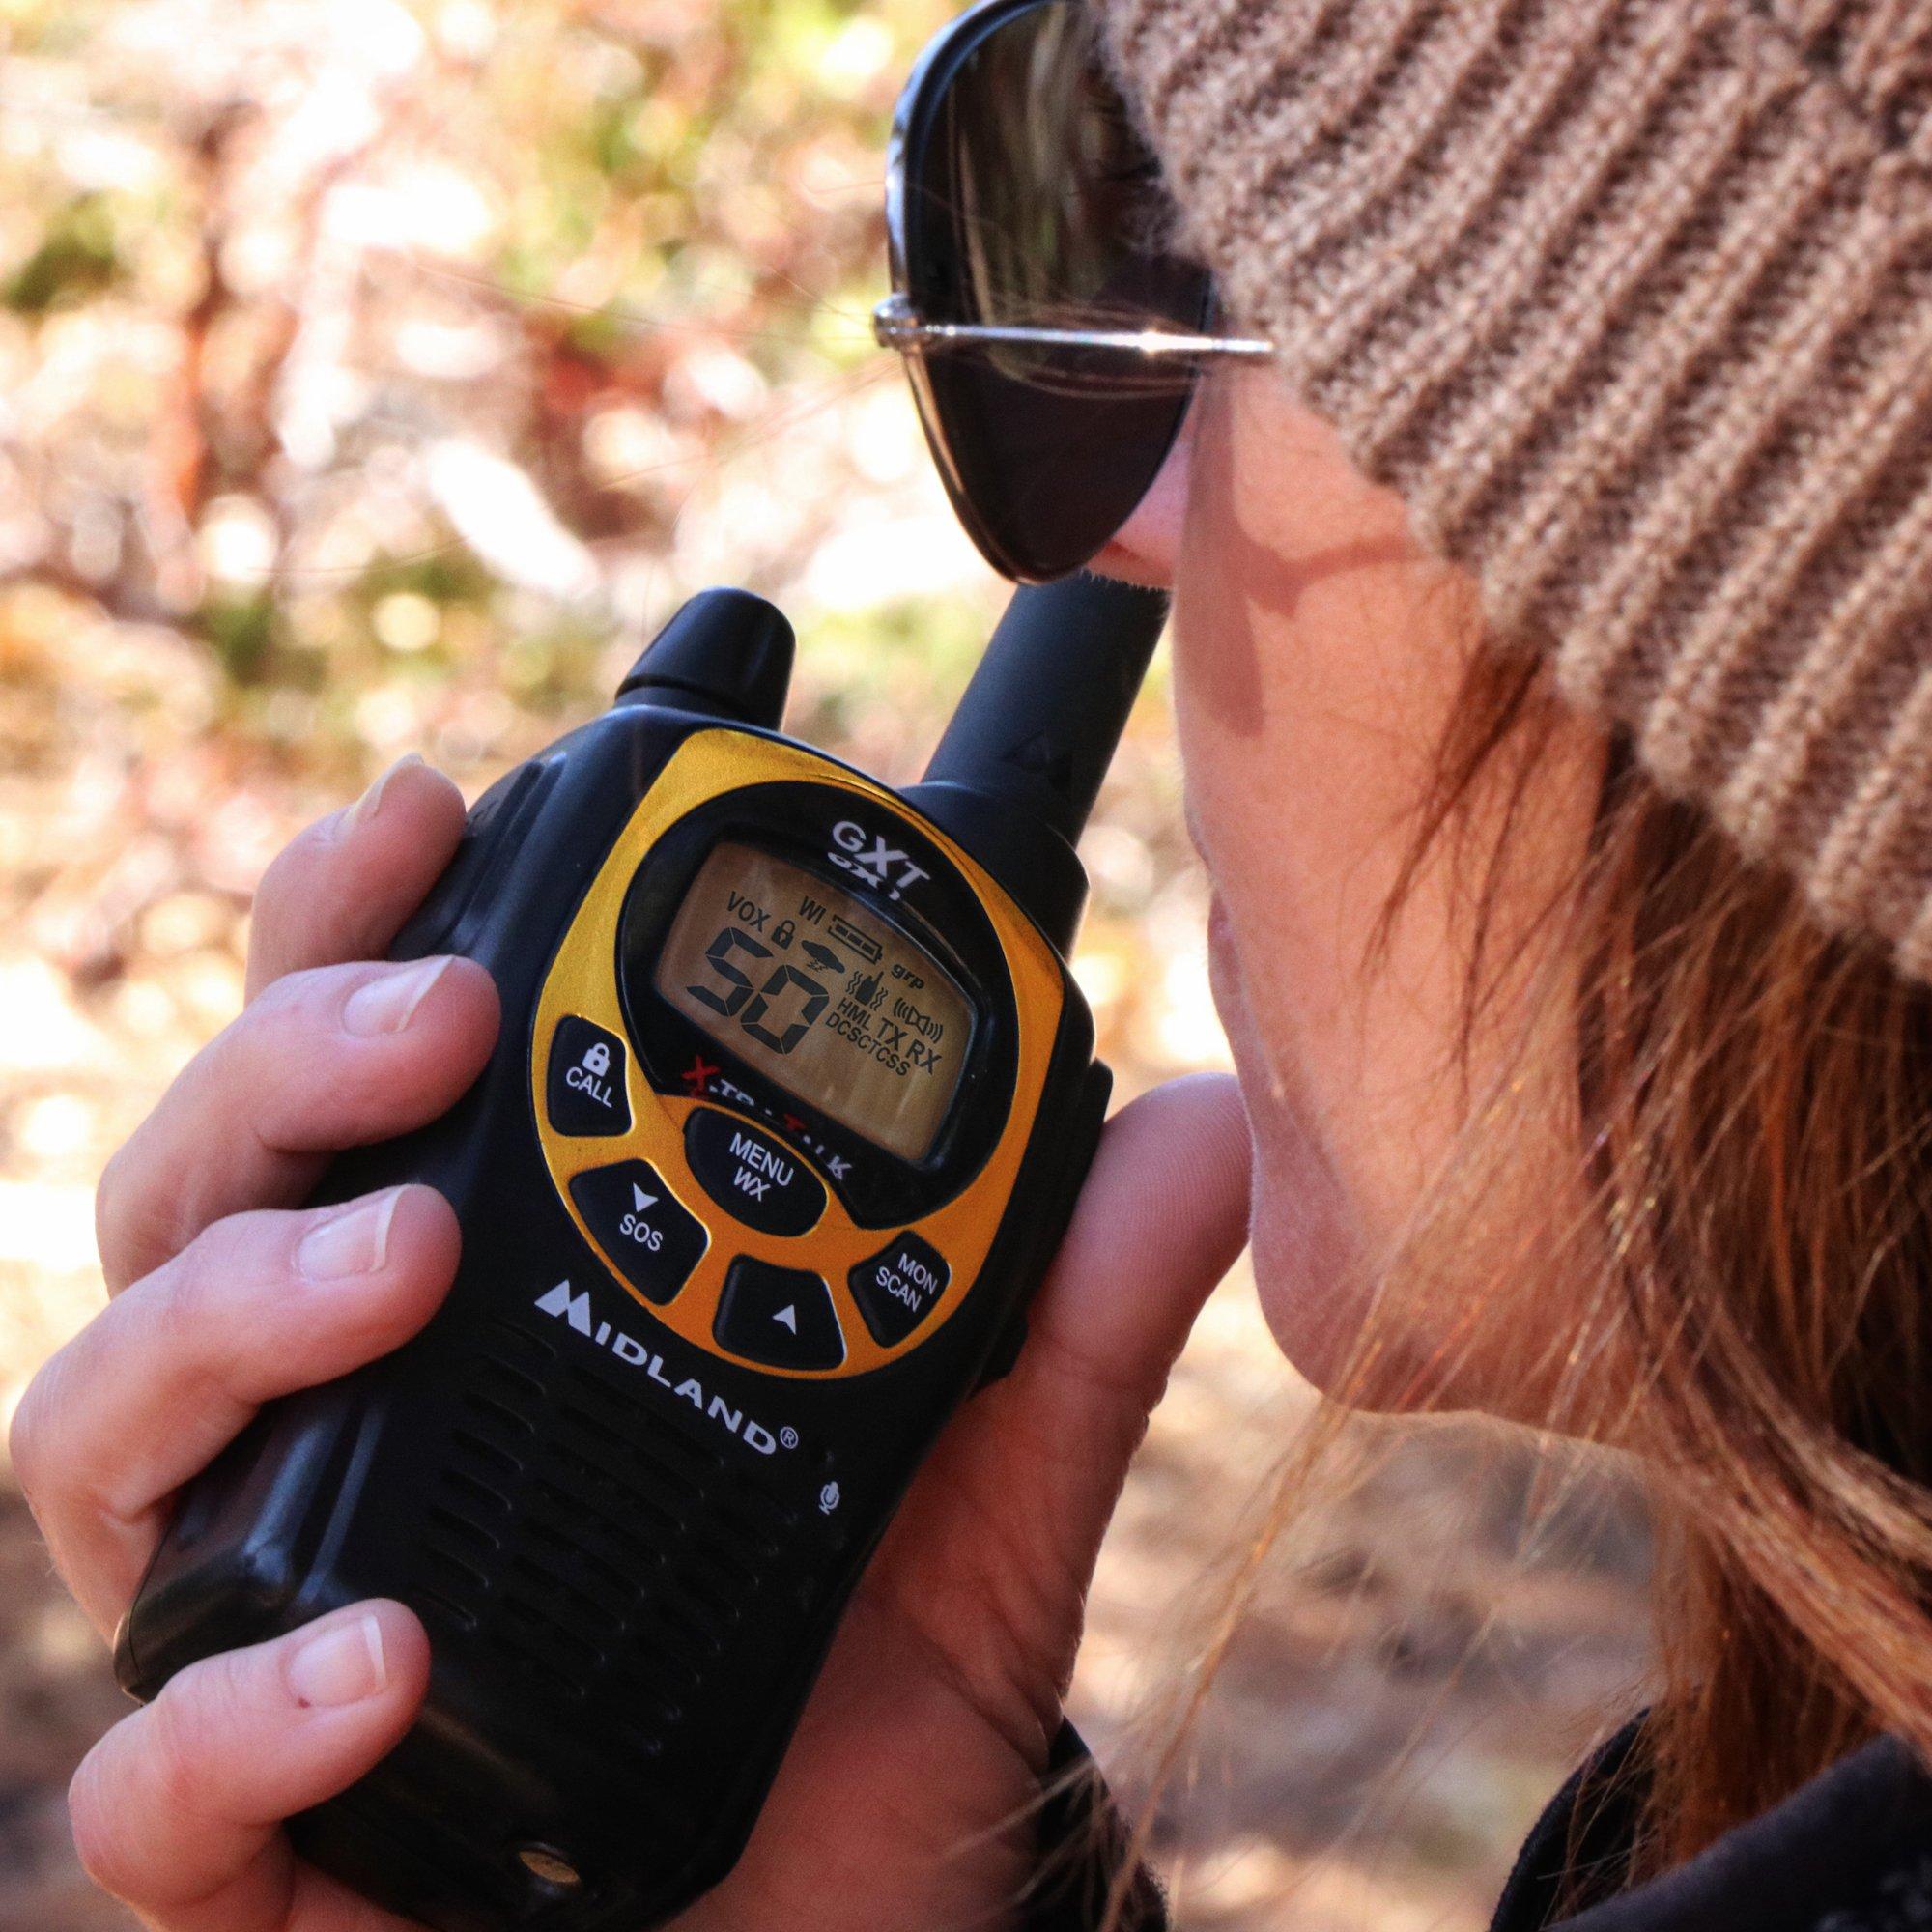 Midland - GXT1030VP4, 50 Channel GMRS Two-Way Radio - Up to 36 Mile Range Walkie Talkie, 142 Privacy Codes, Waterproof, NOAA Weather Scan + Alert (Pair Pack) (Black/Yellow) by Midland (Image #5)